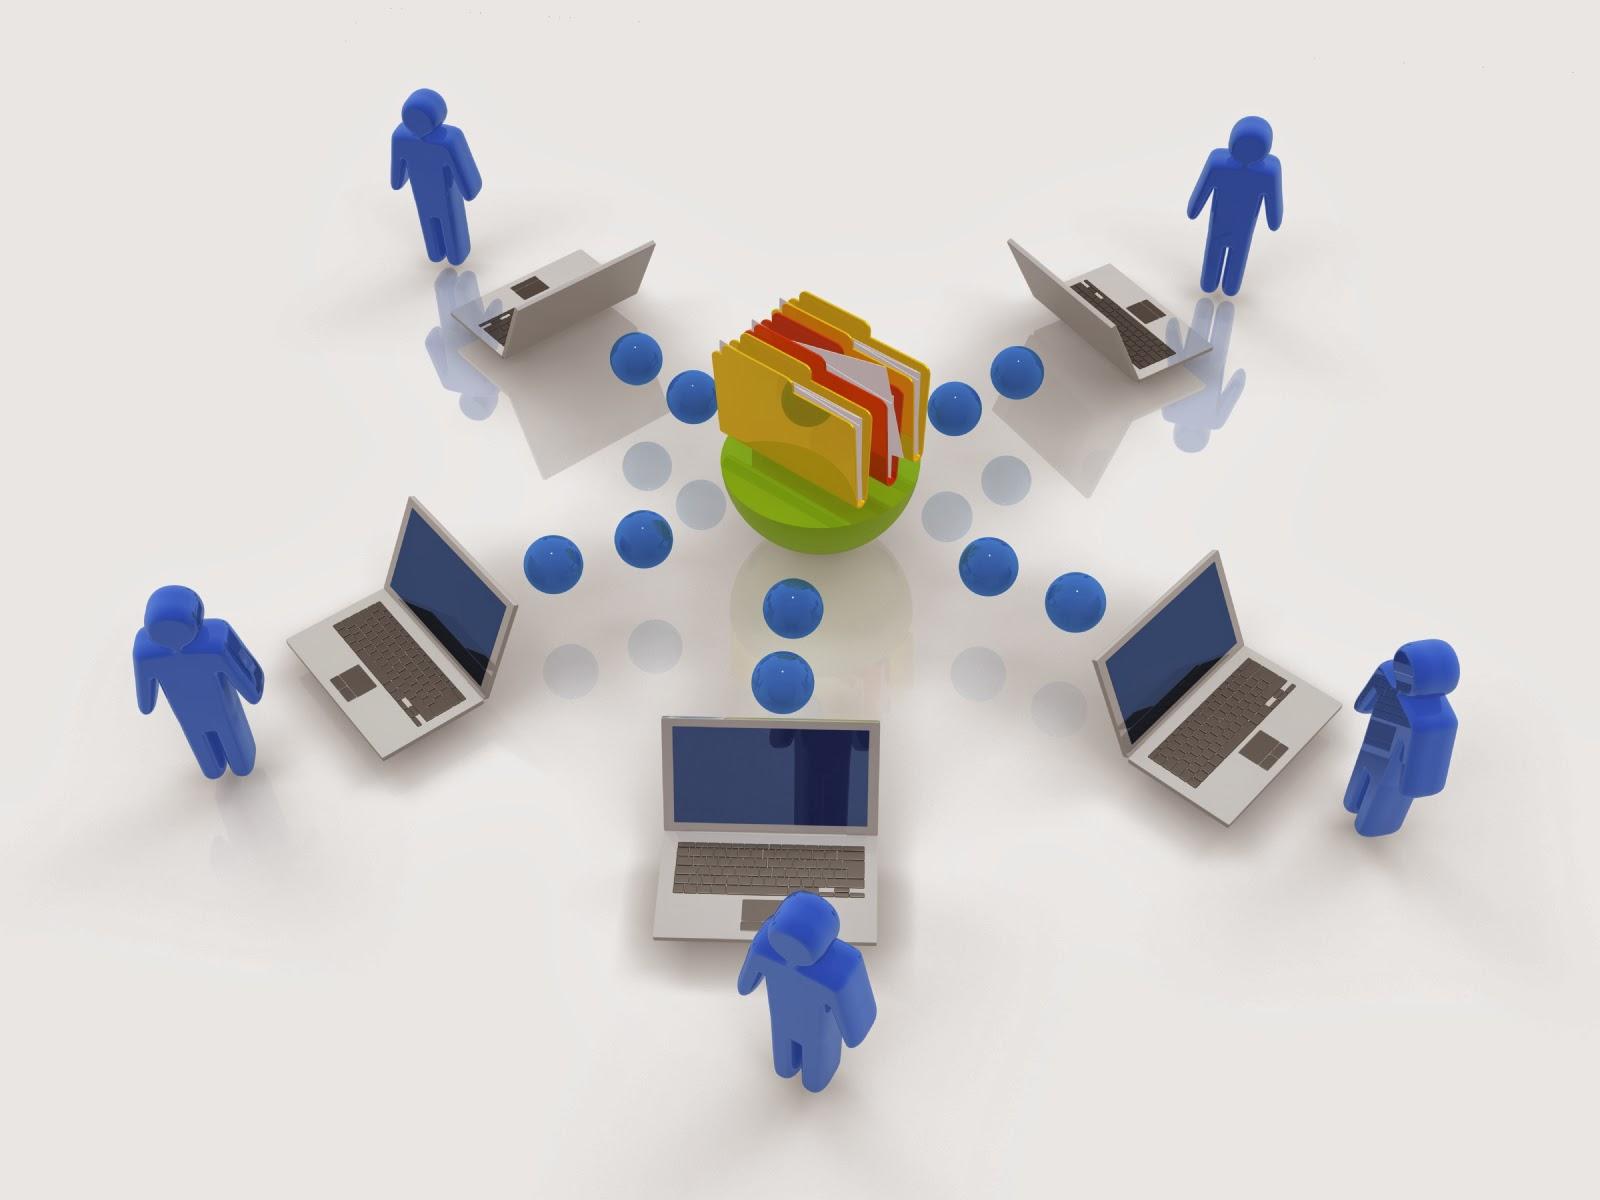 Sistem Manajemen proyek